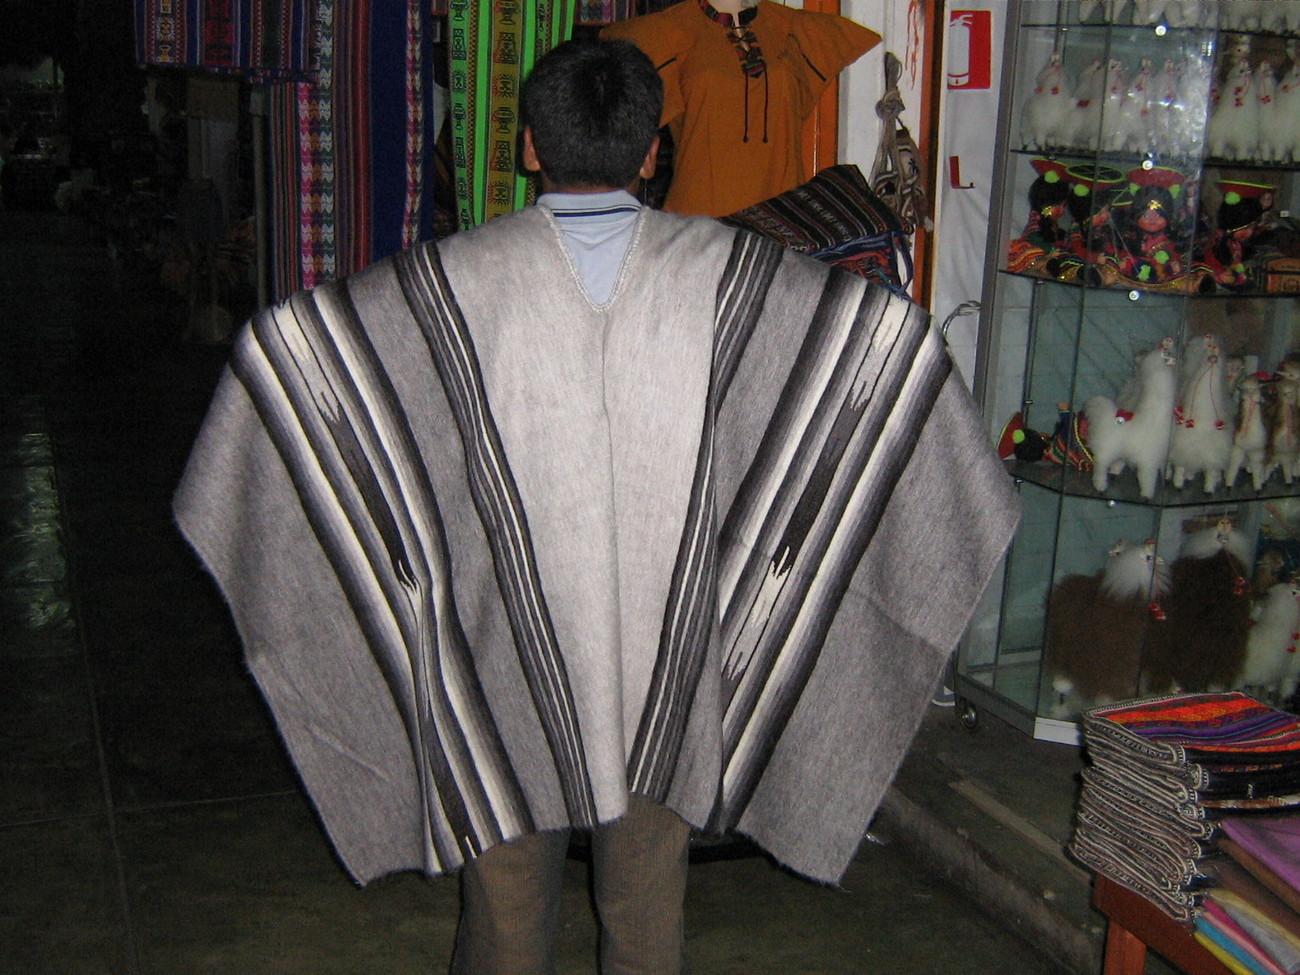 Peruvian Poncho,outerwear, alpaca wool, grey coat